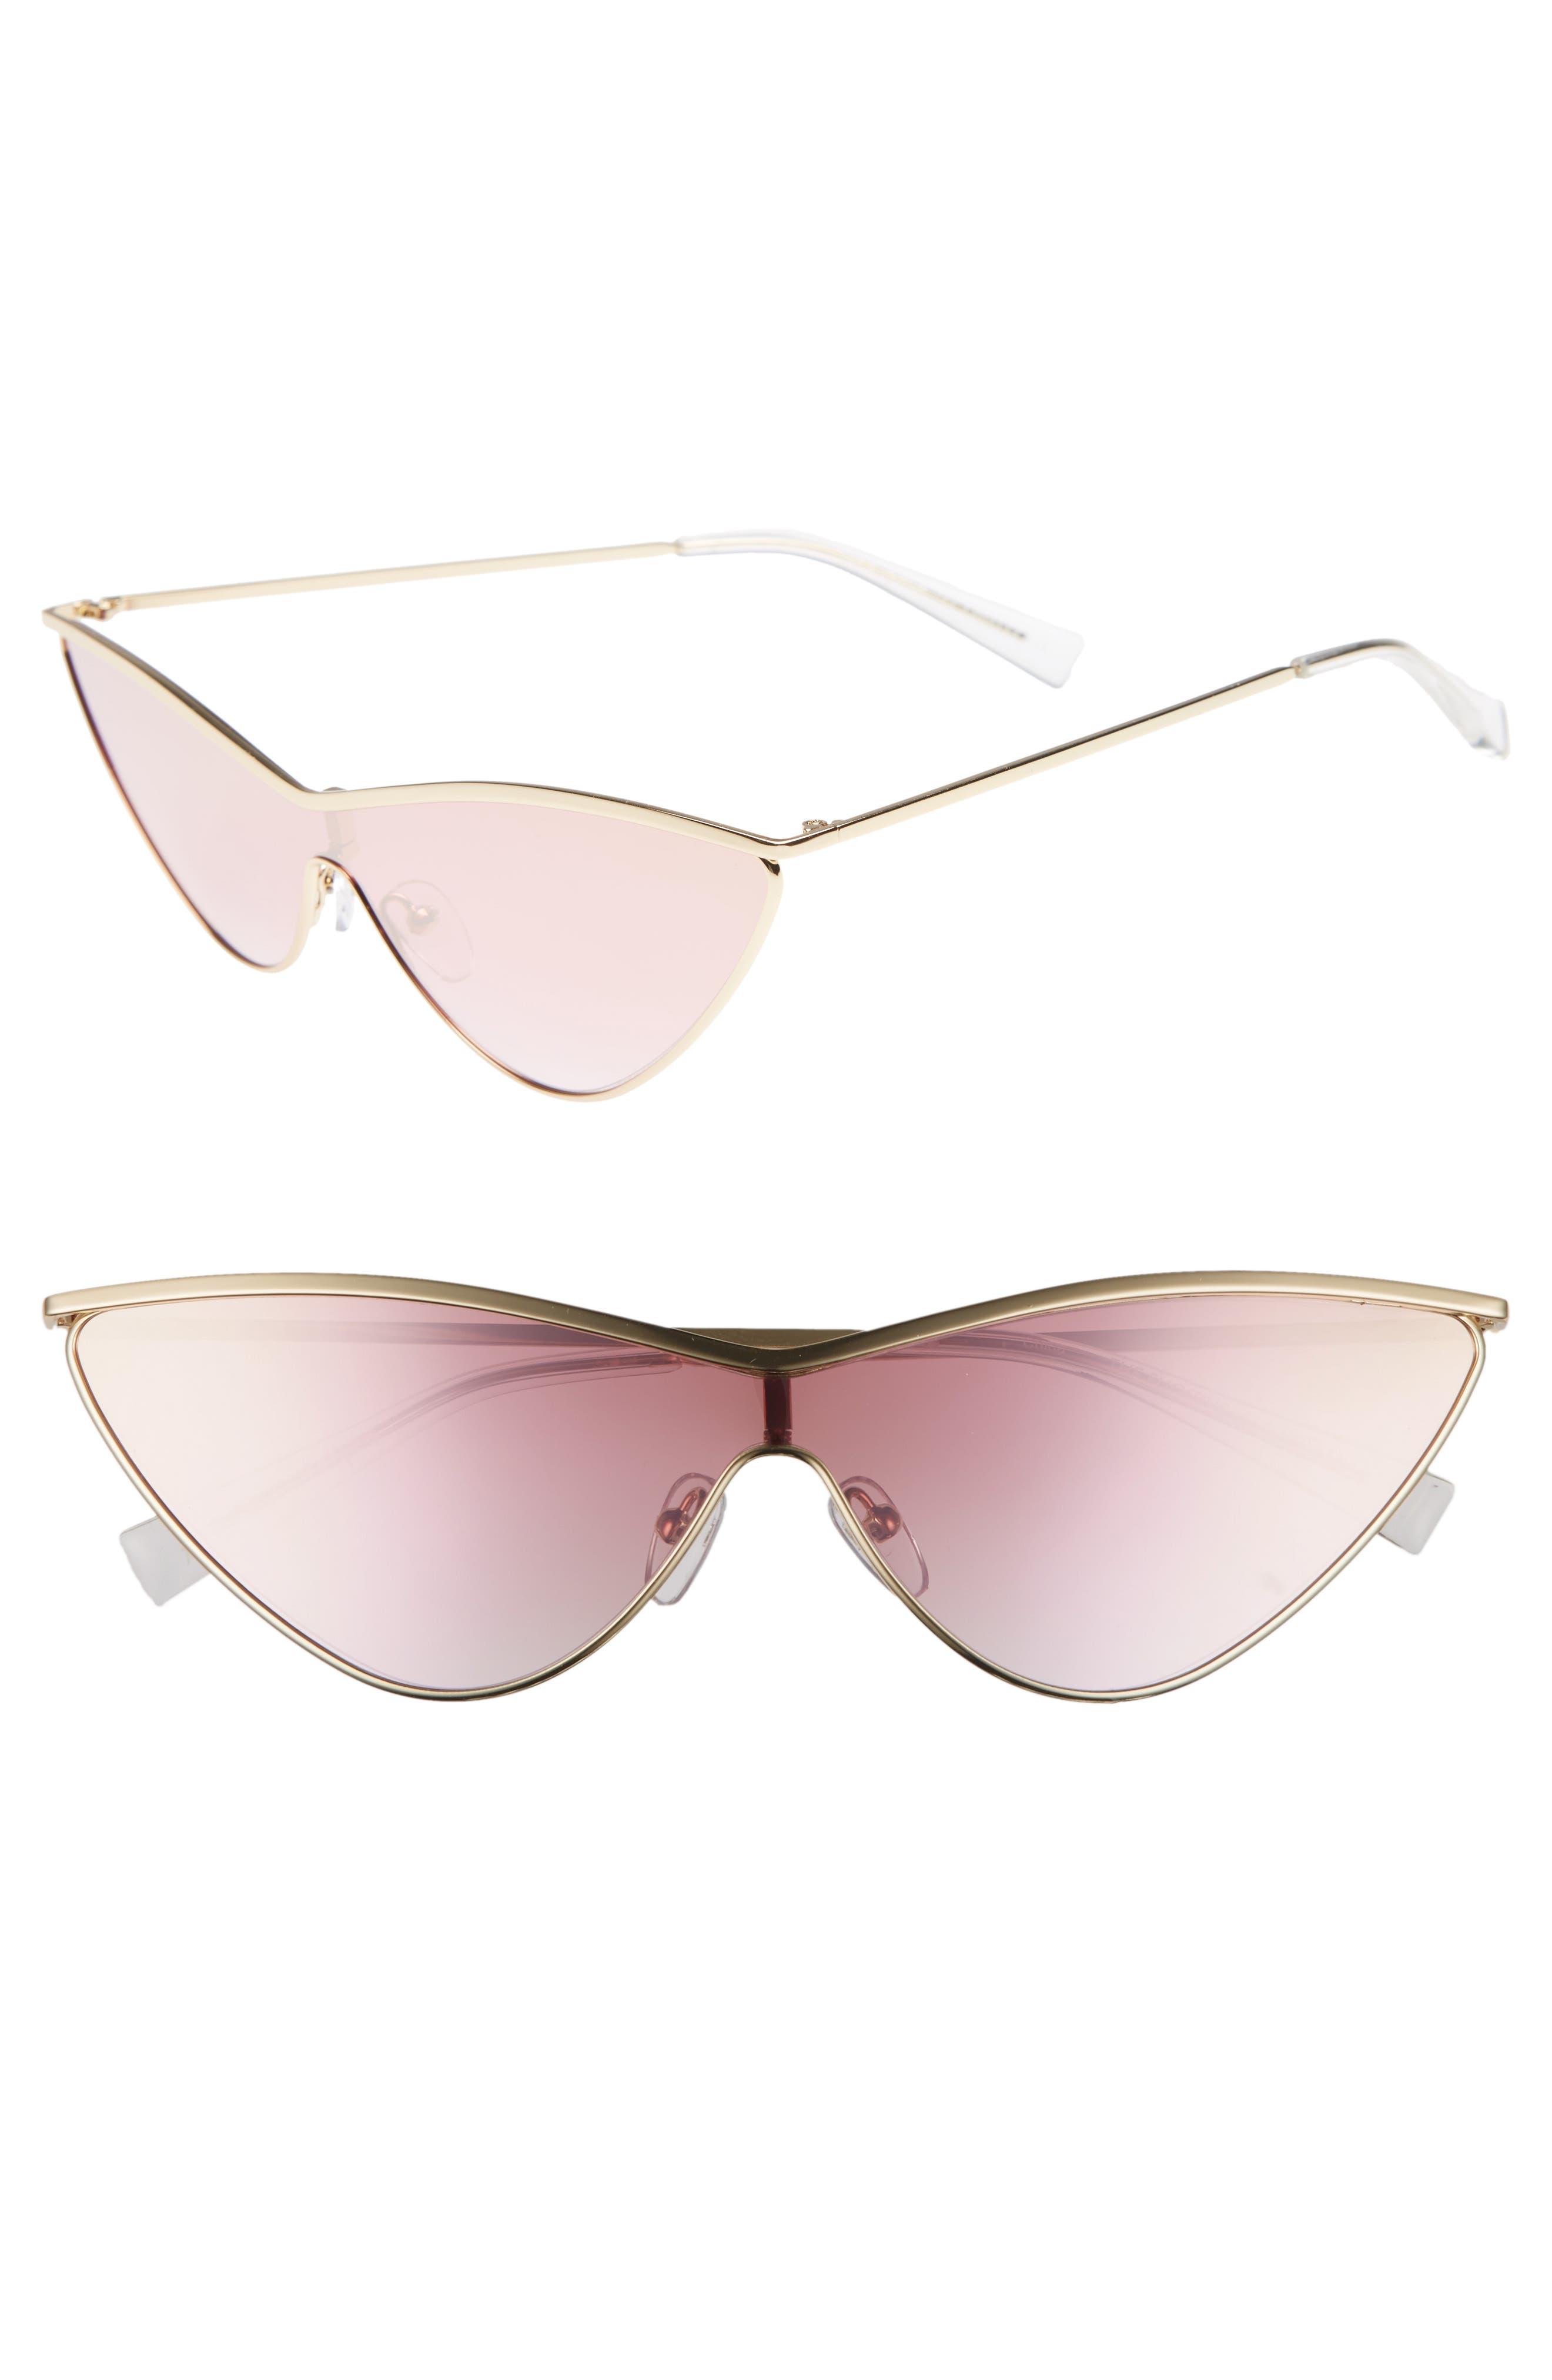 Main Image - Adam Selman x Le Specs Luxe The Fugitive 71mm Sunglasses